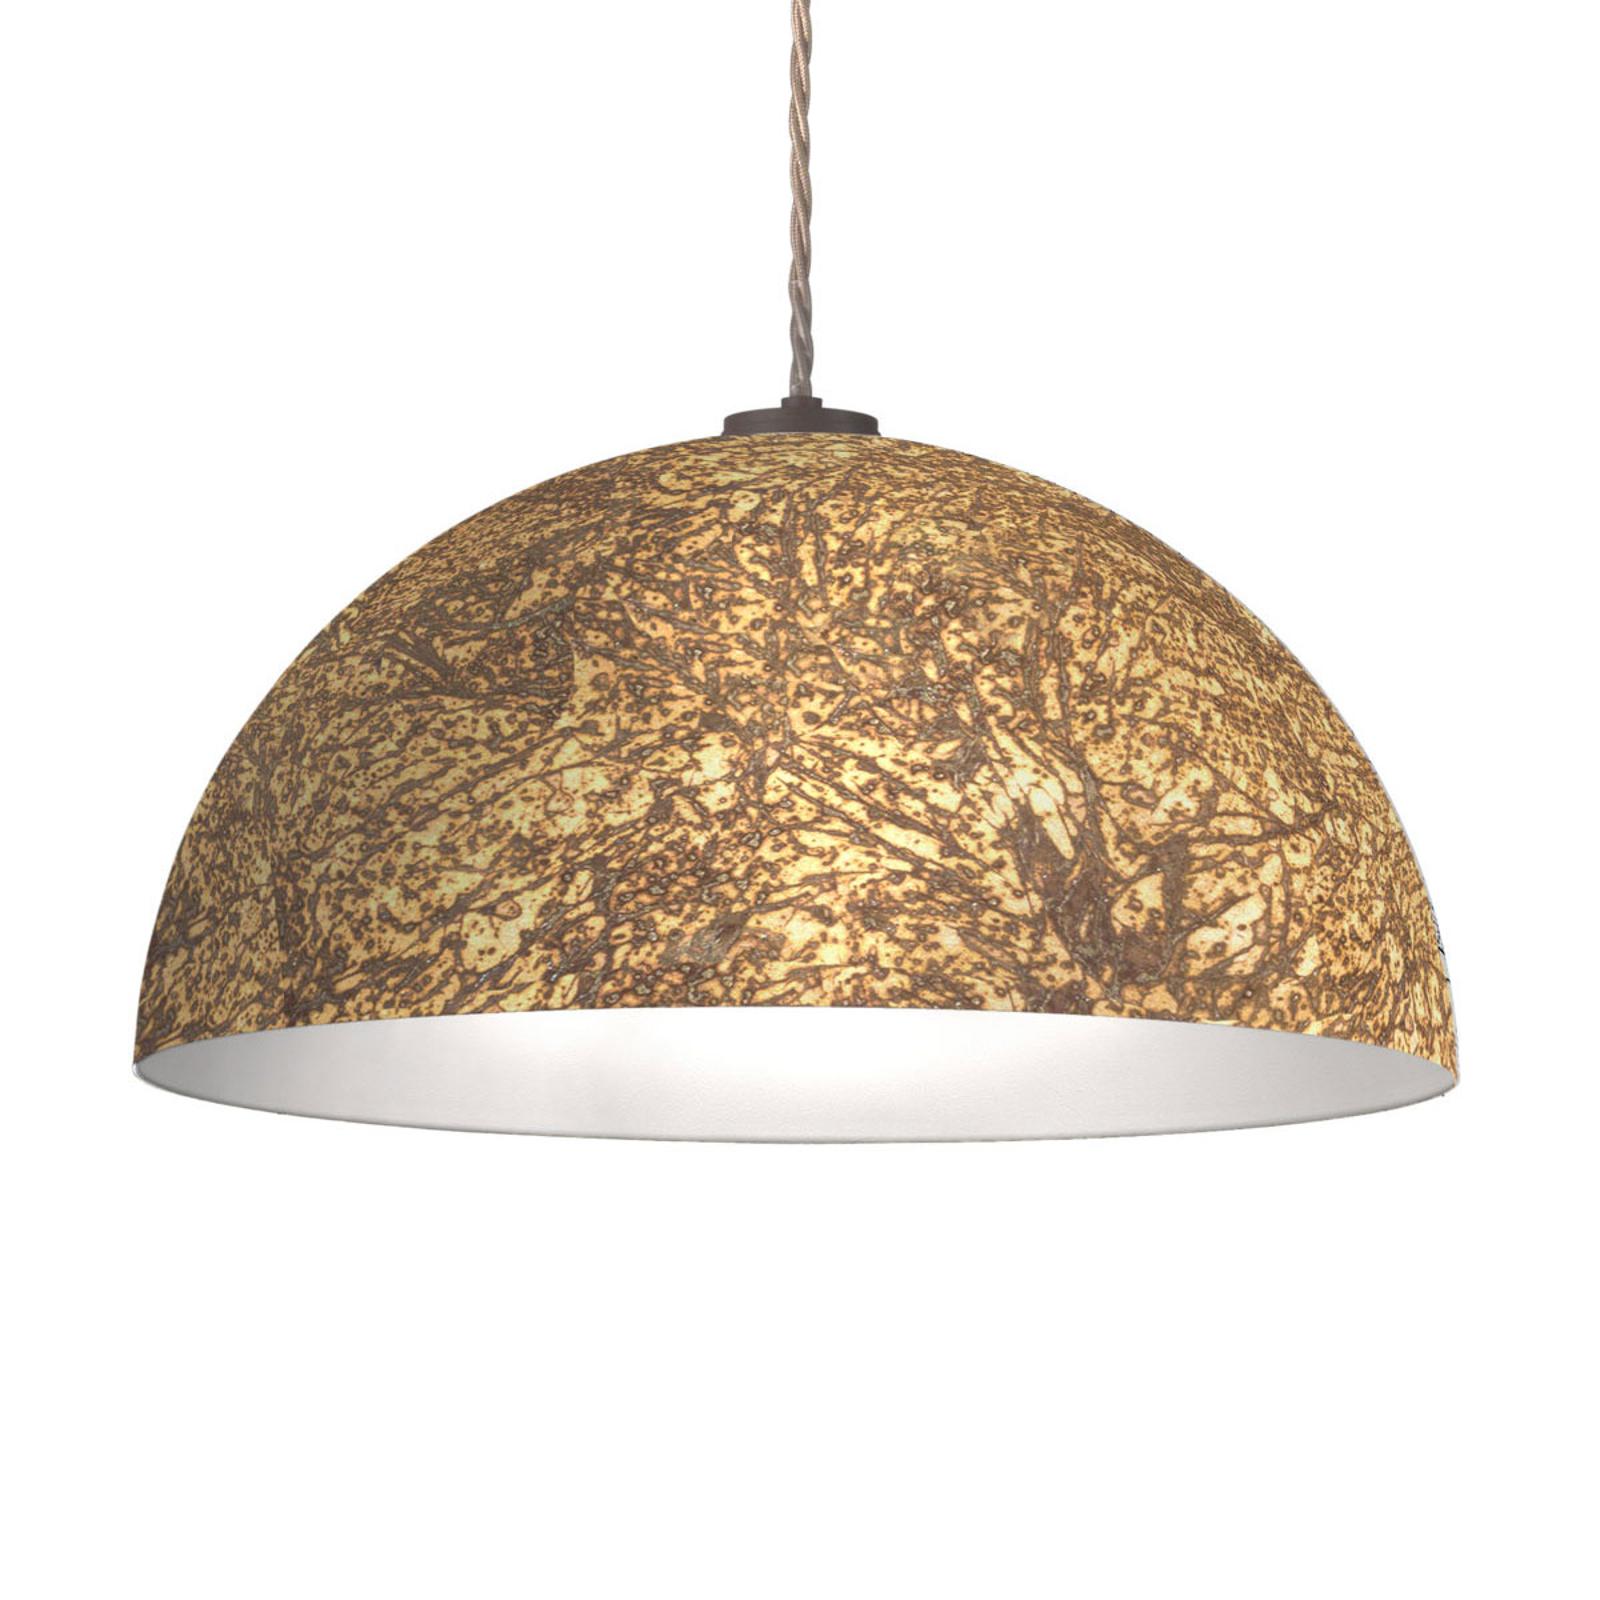 Lampa wisząca Cult Vintage, złota, Ø 50 cm